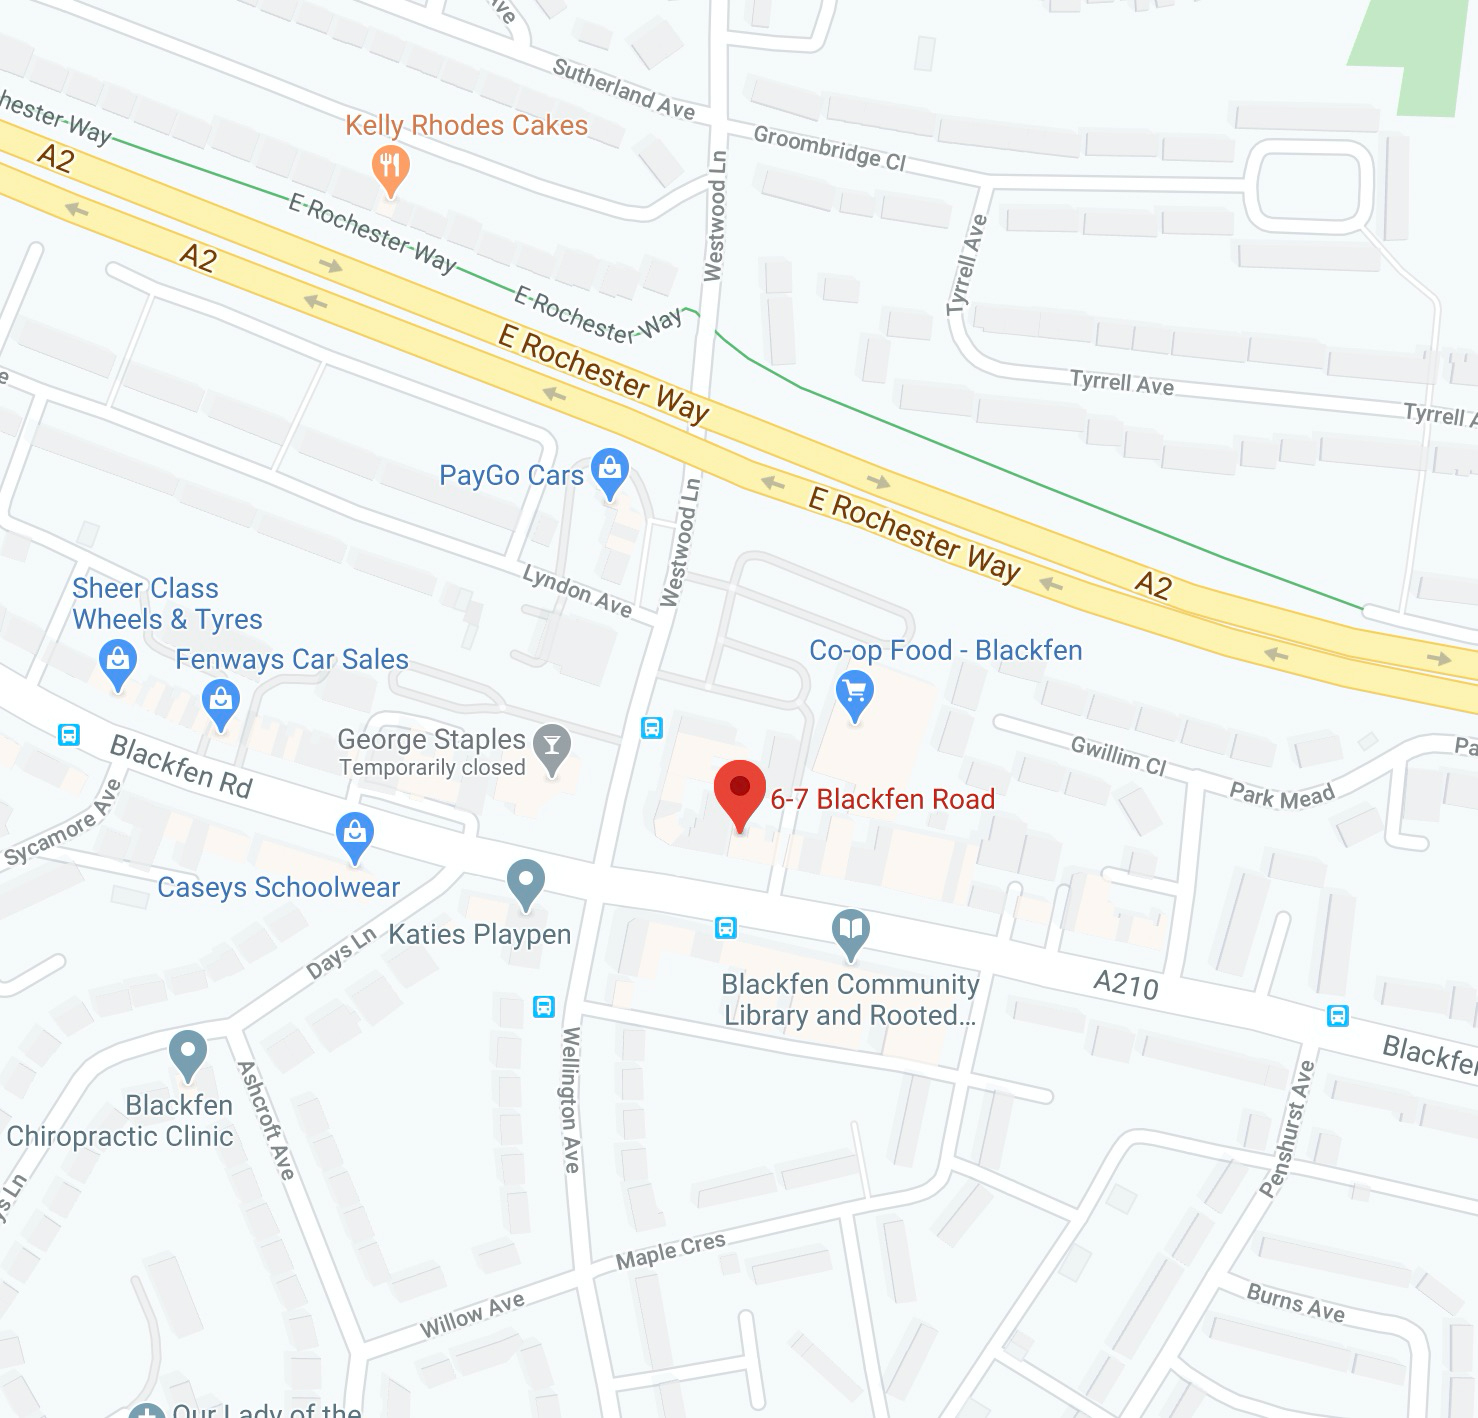 Map location of Blackfen Community Library